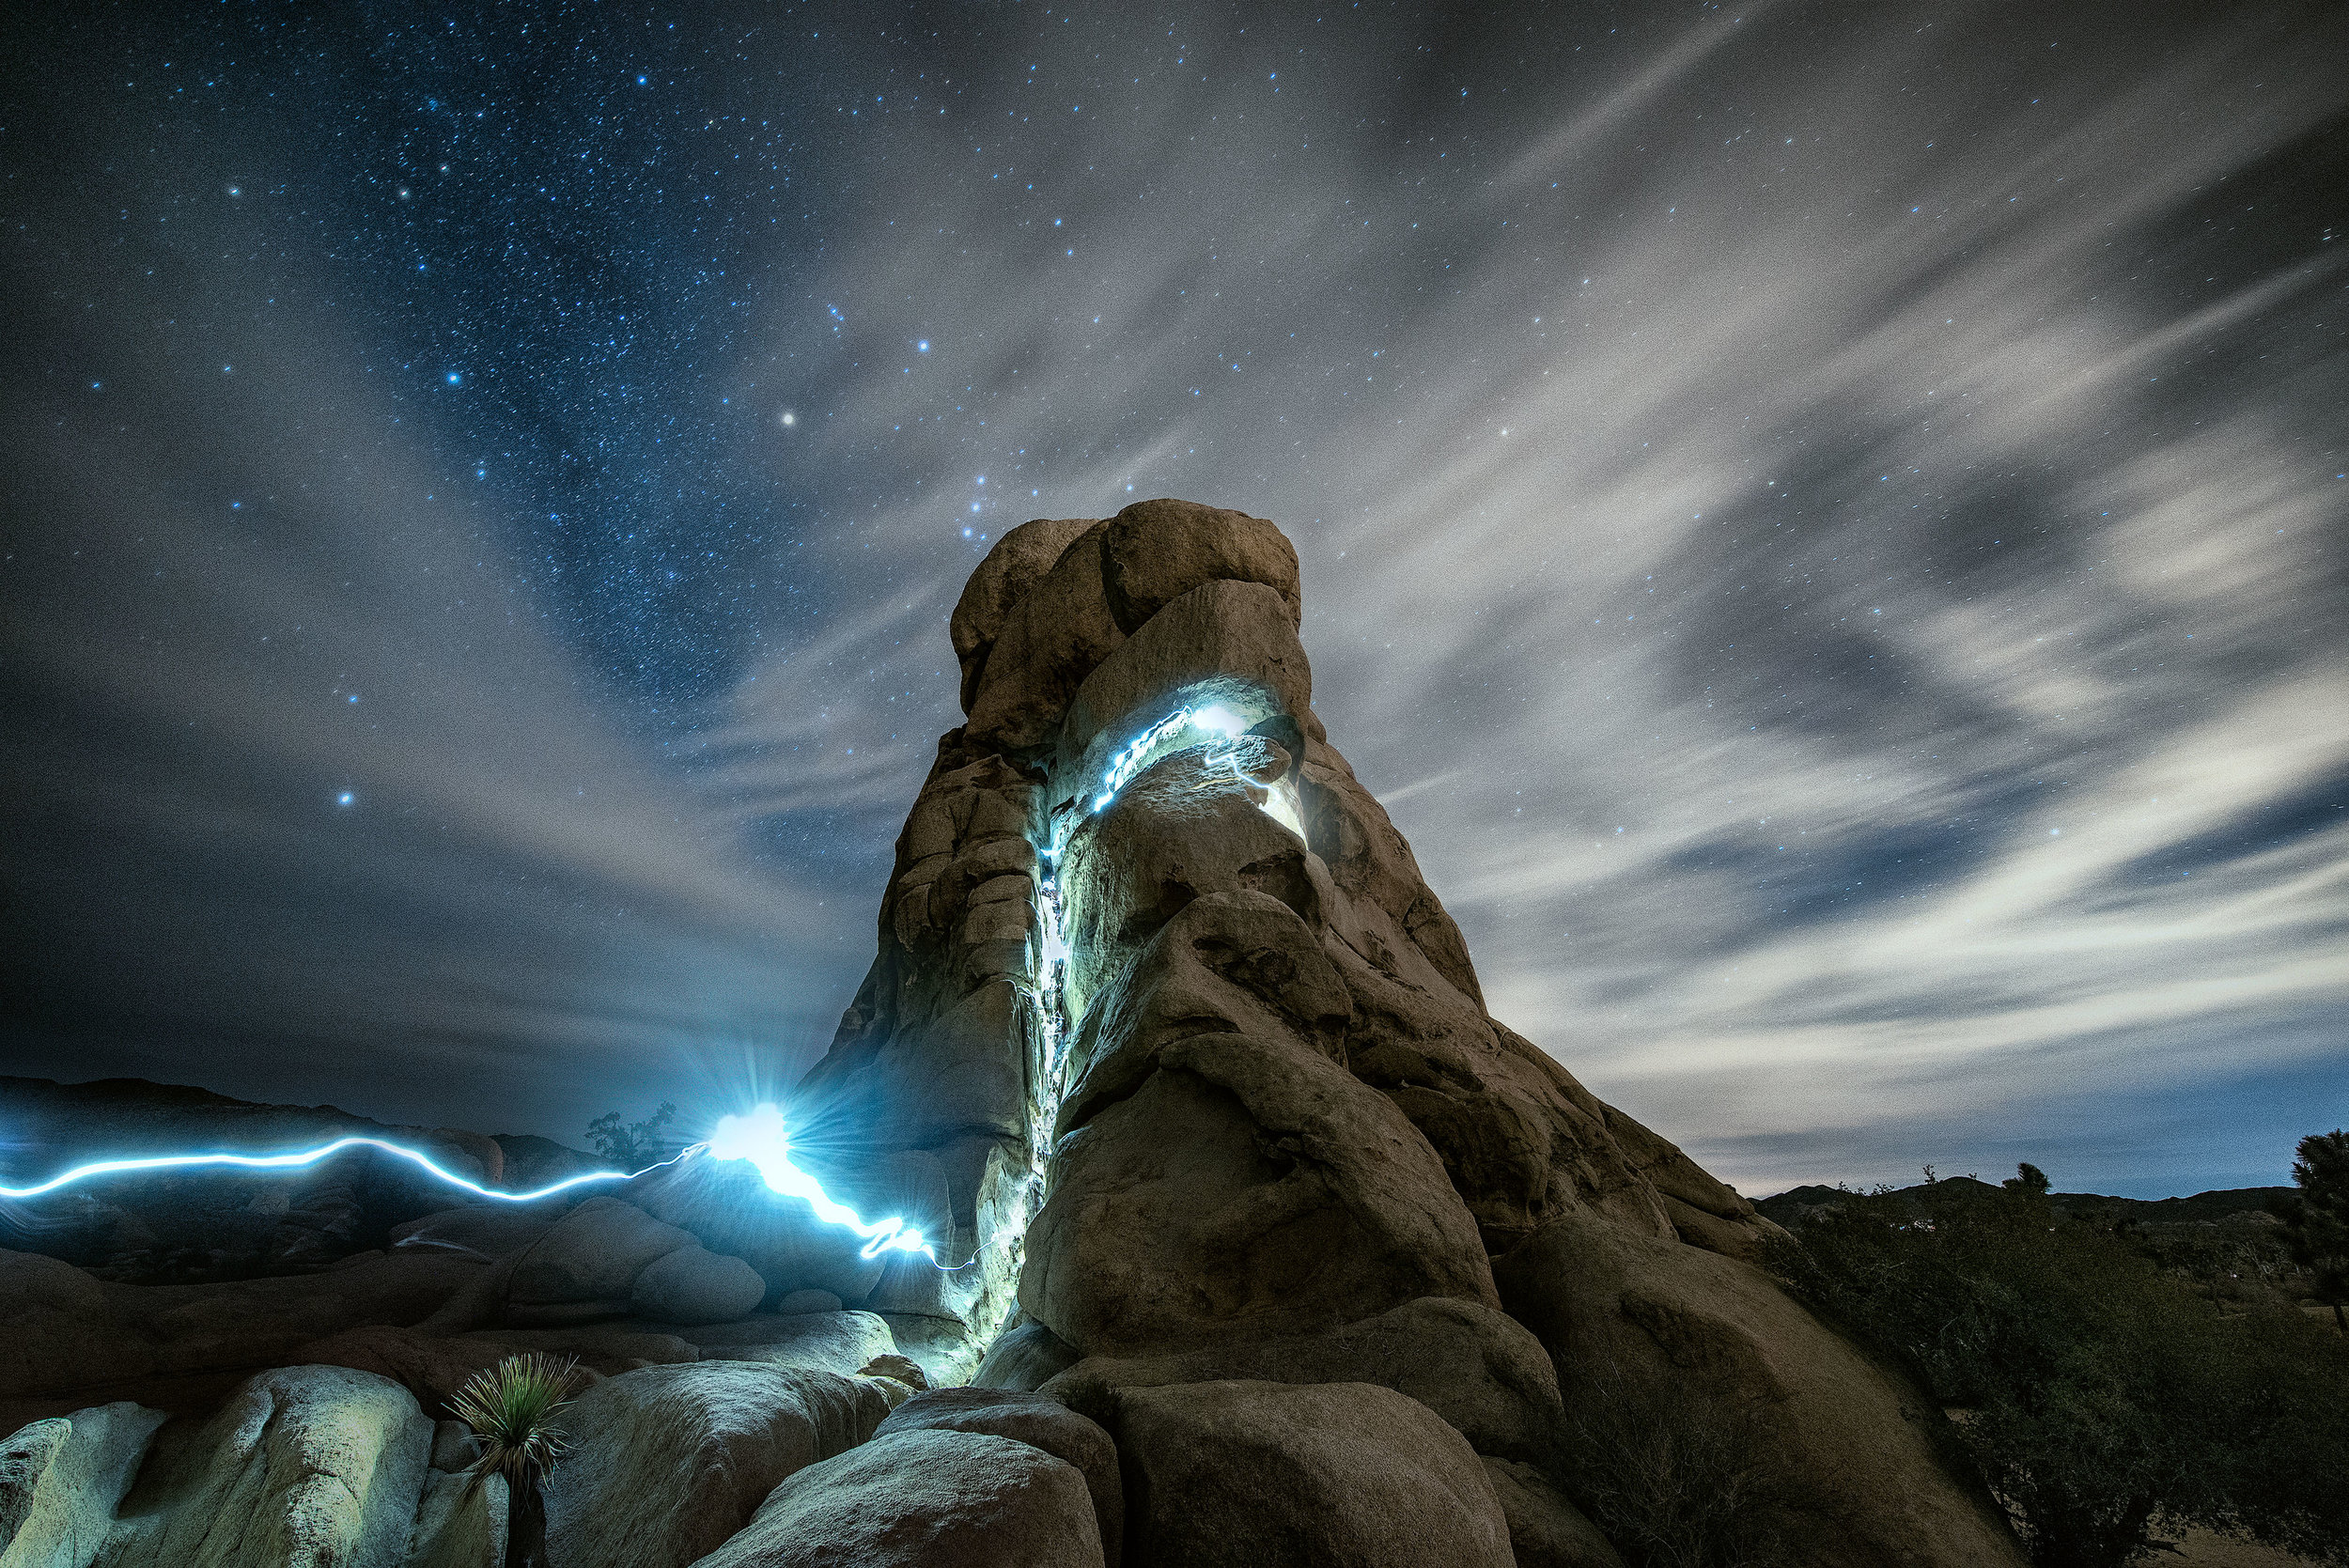 austin-trigg-joshua-tree-national-park-long-exposure-rock-climbing-night-sky-stars-clouds-streak.jpg